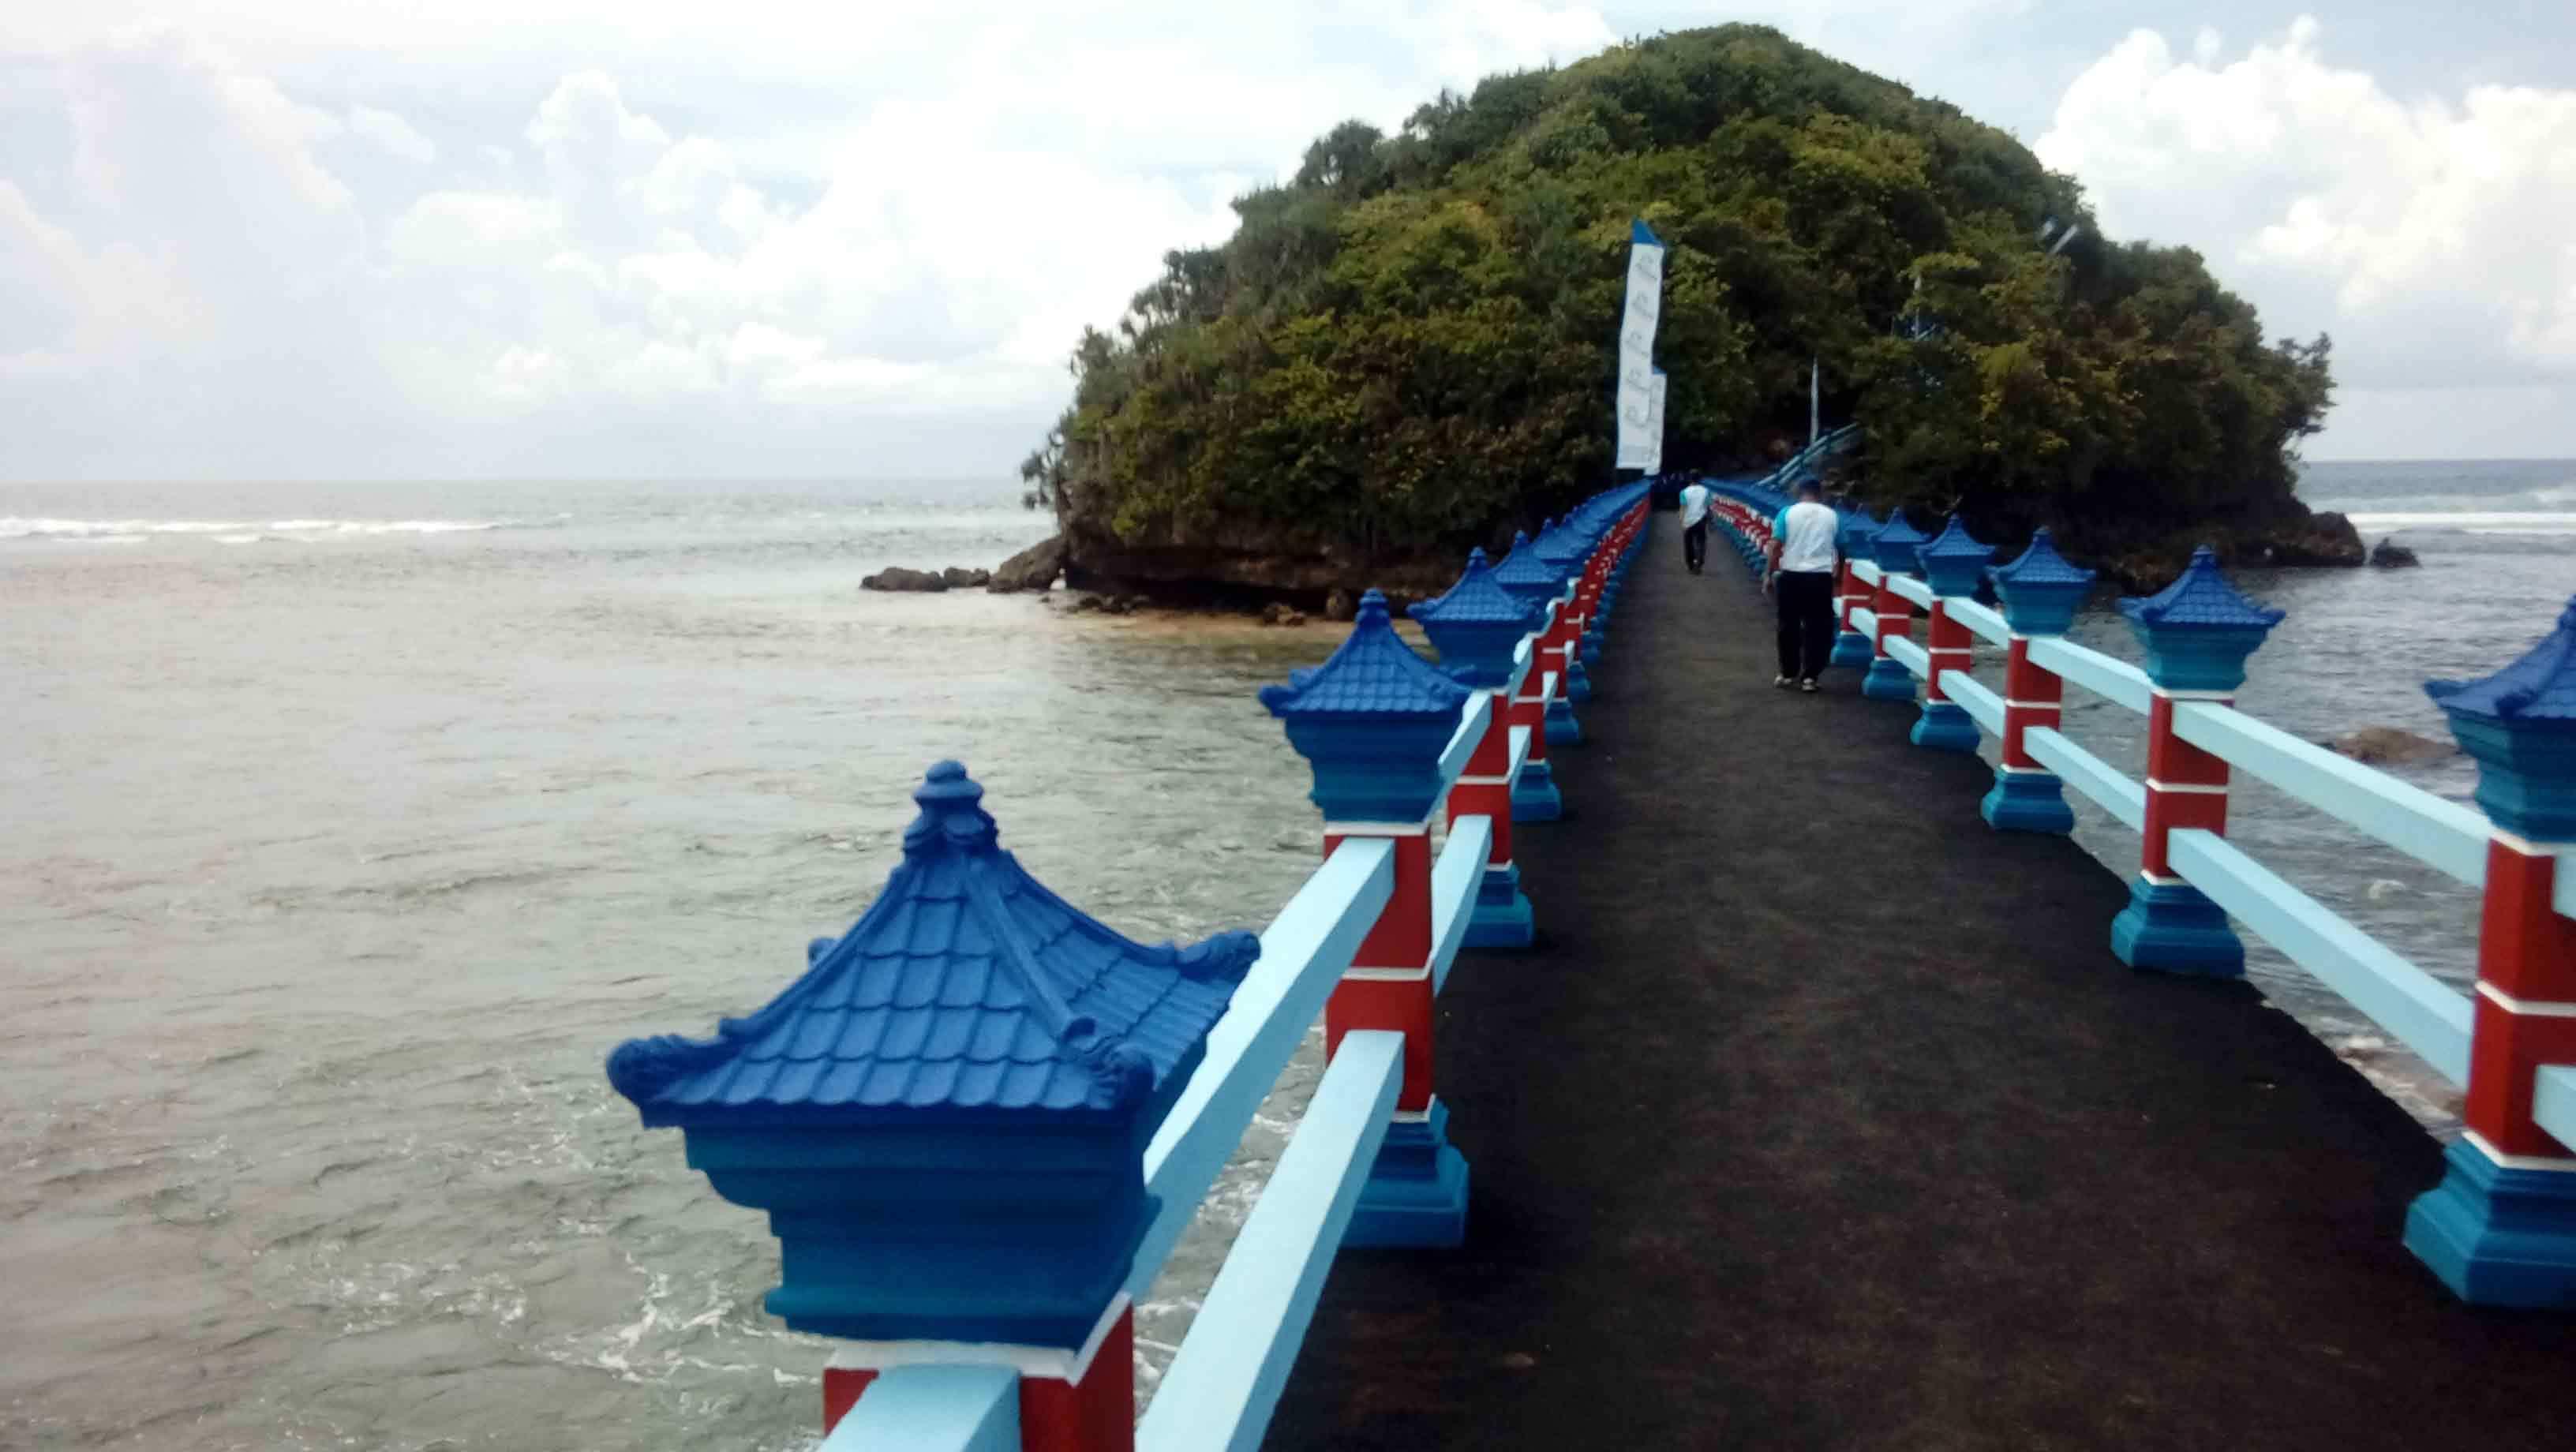 Jembatan Hanoman Ikon Wisata Pantai Balekambang Malang Menghubungkan Panjang Pulau